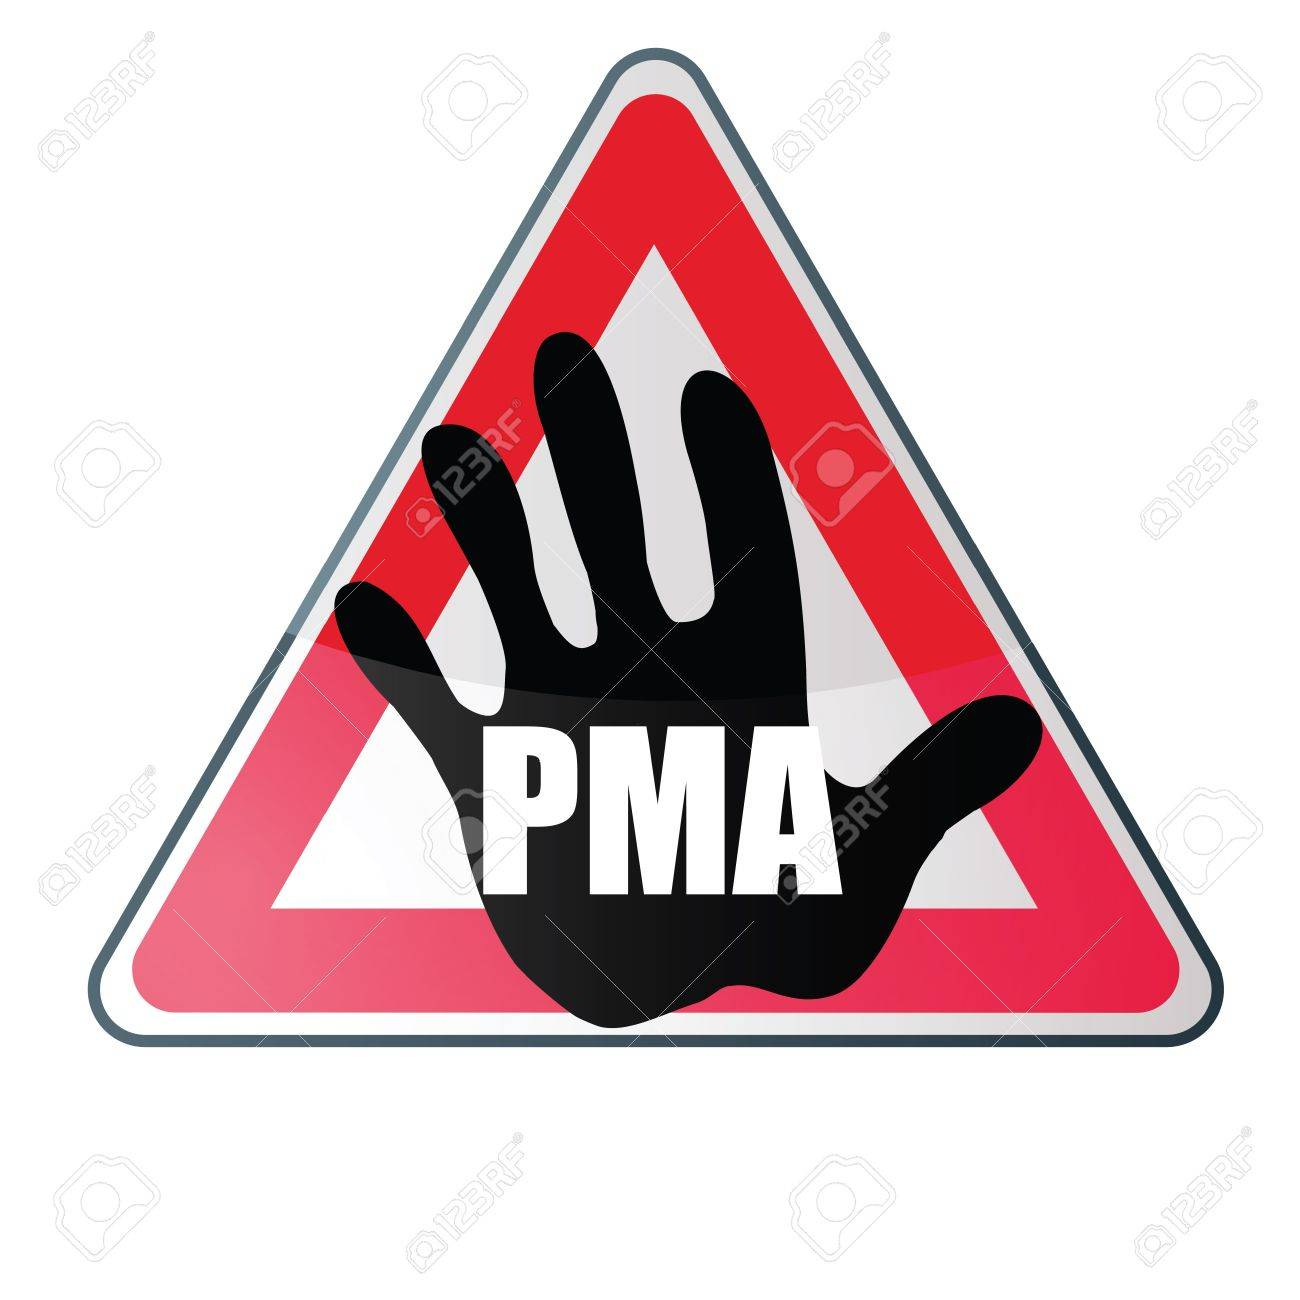 GPA and PMA Stock Vector - 17637986